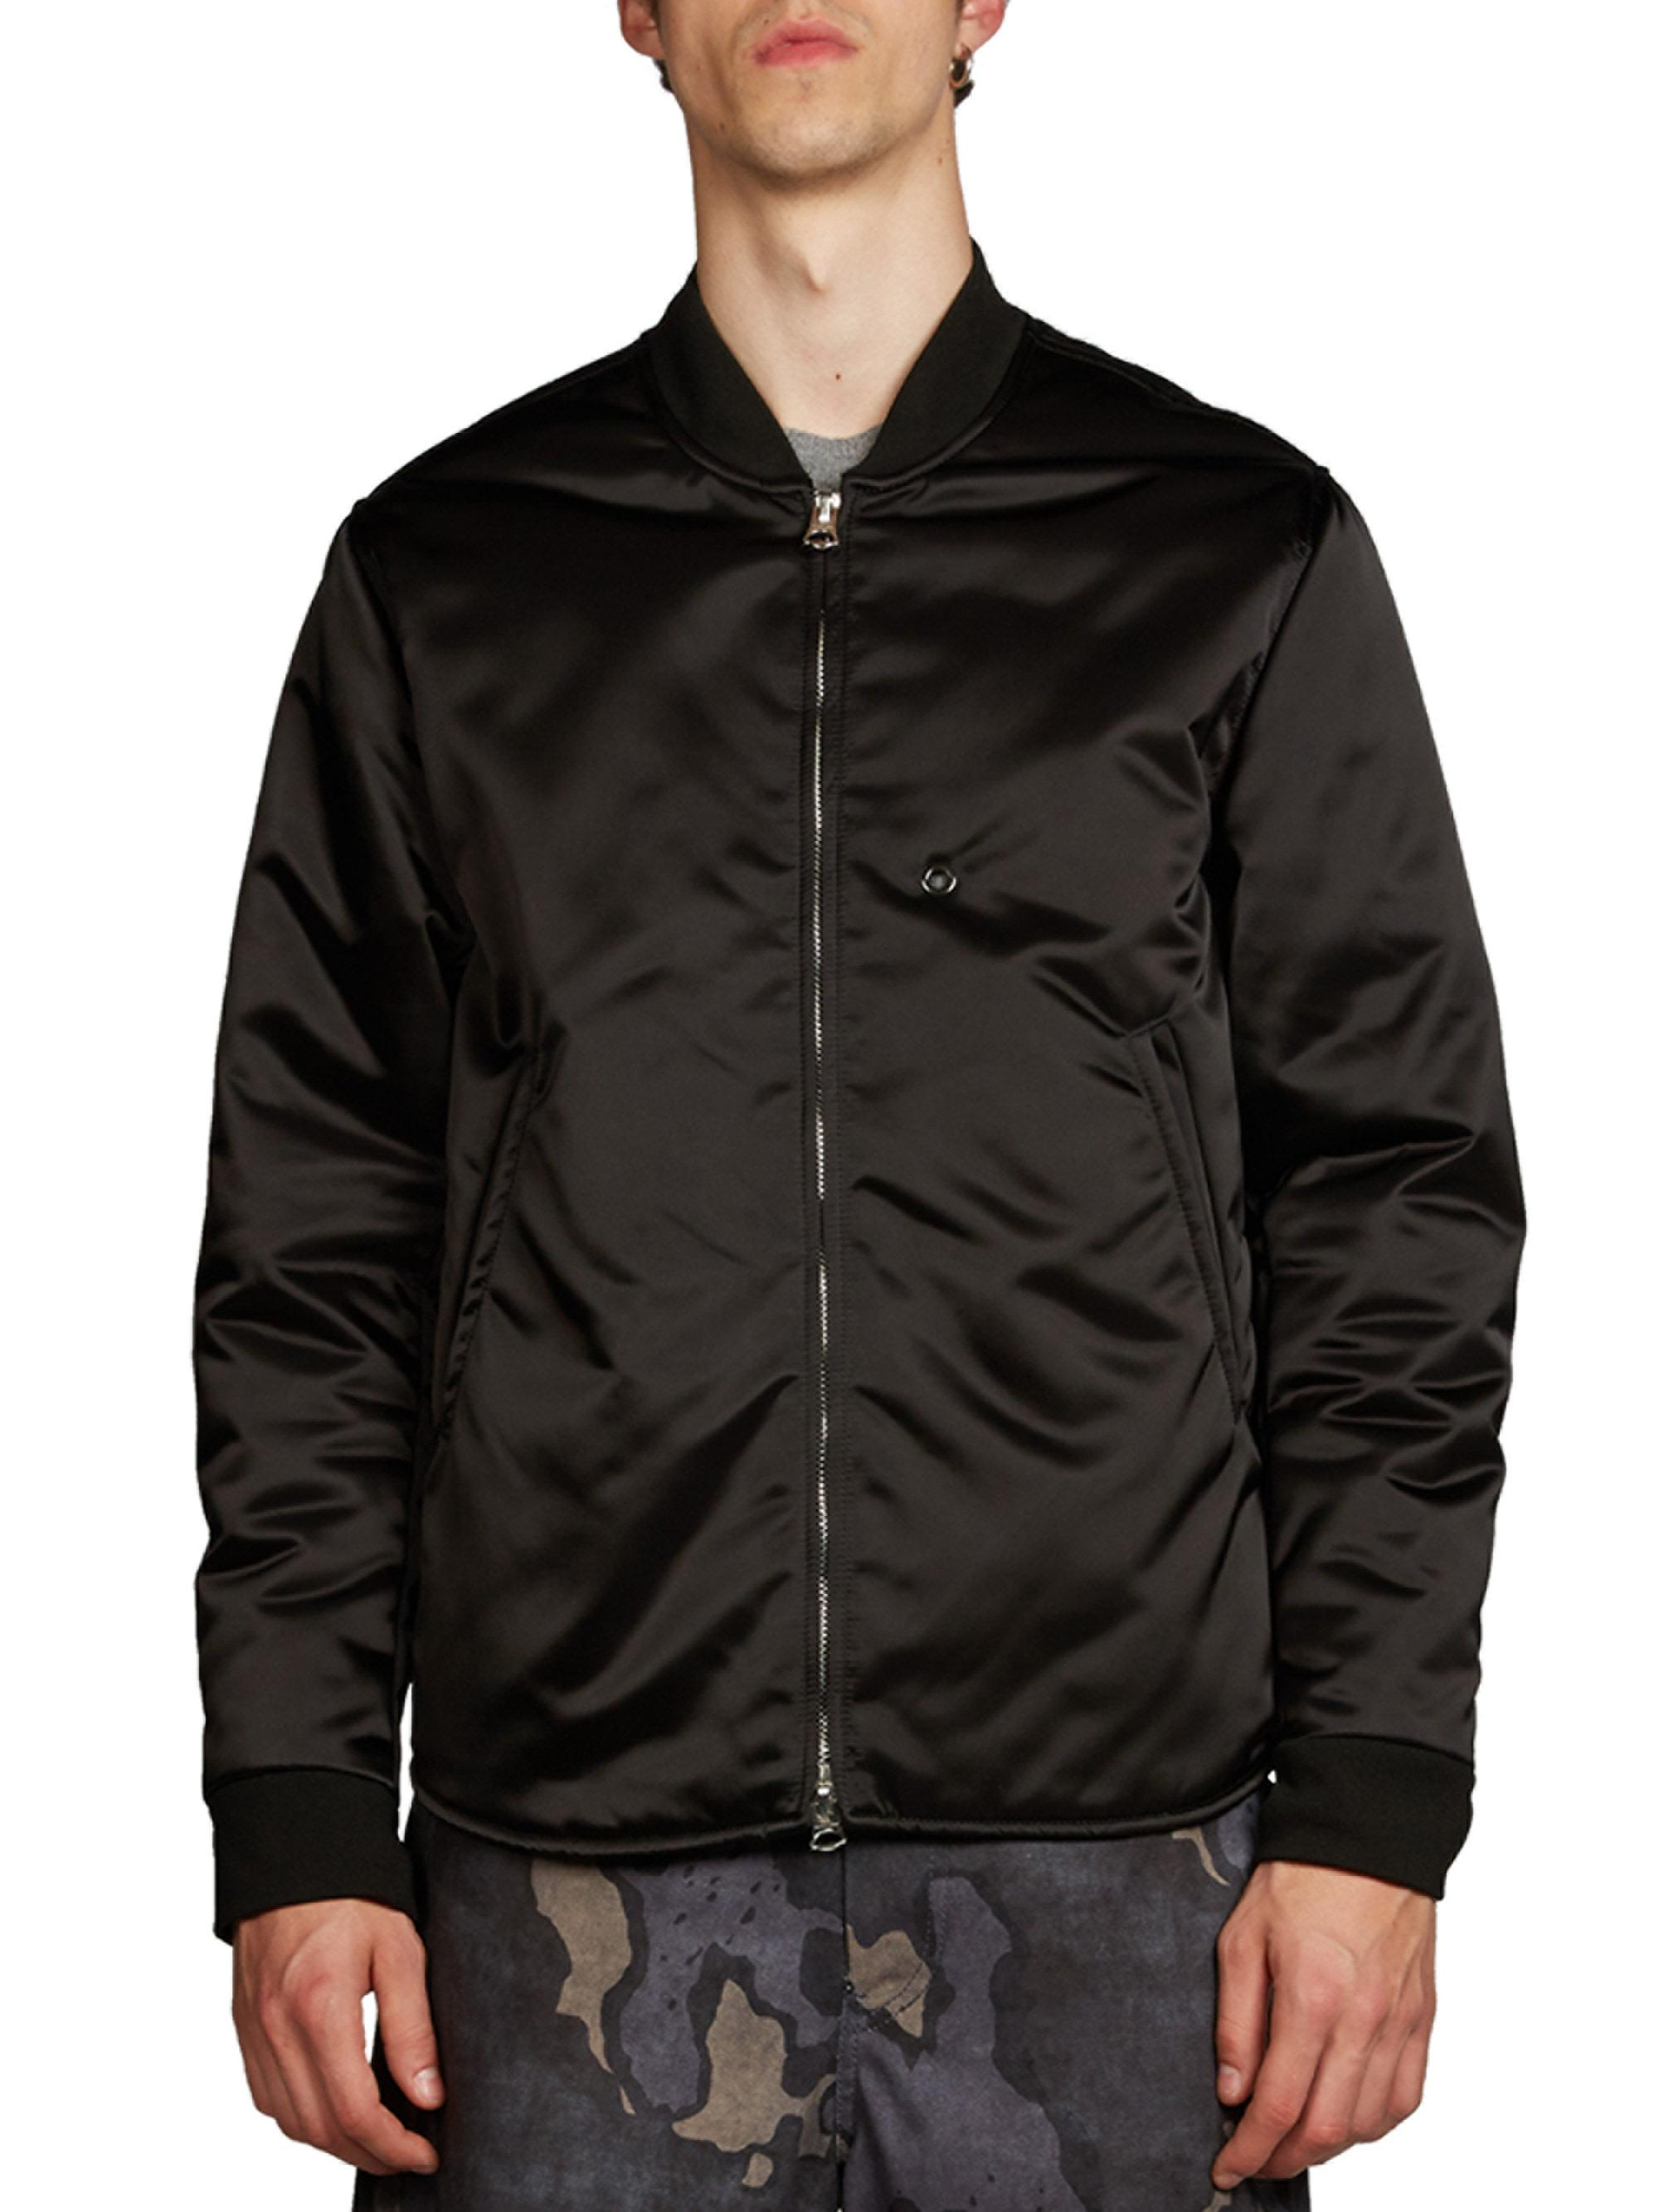 d66ceef09 Acne Studios Mylon Bomber Jacket in Black for Men - Lyst